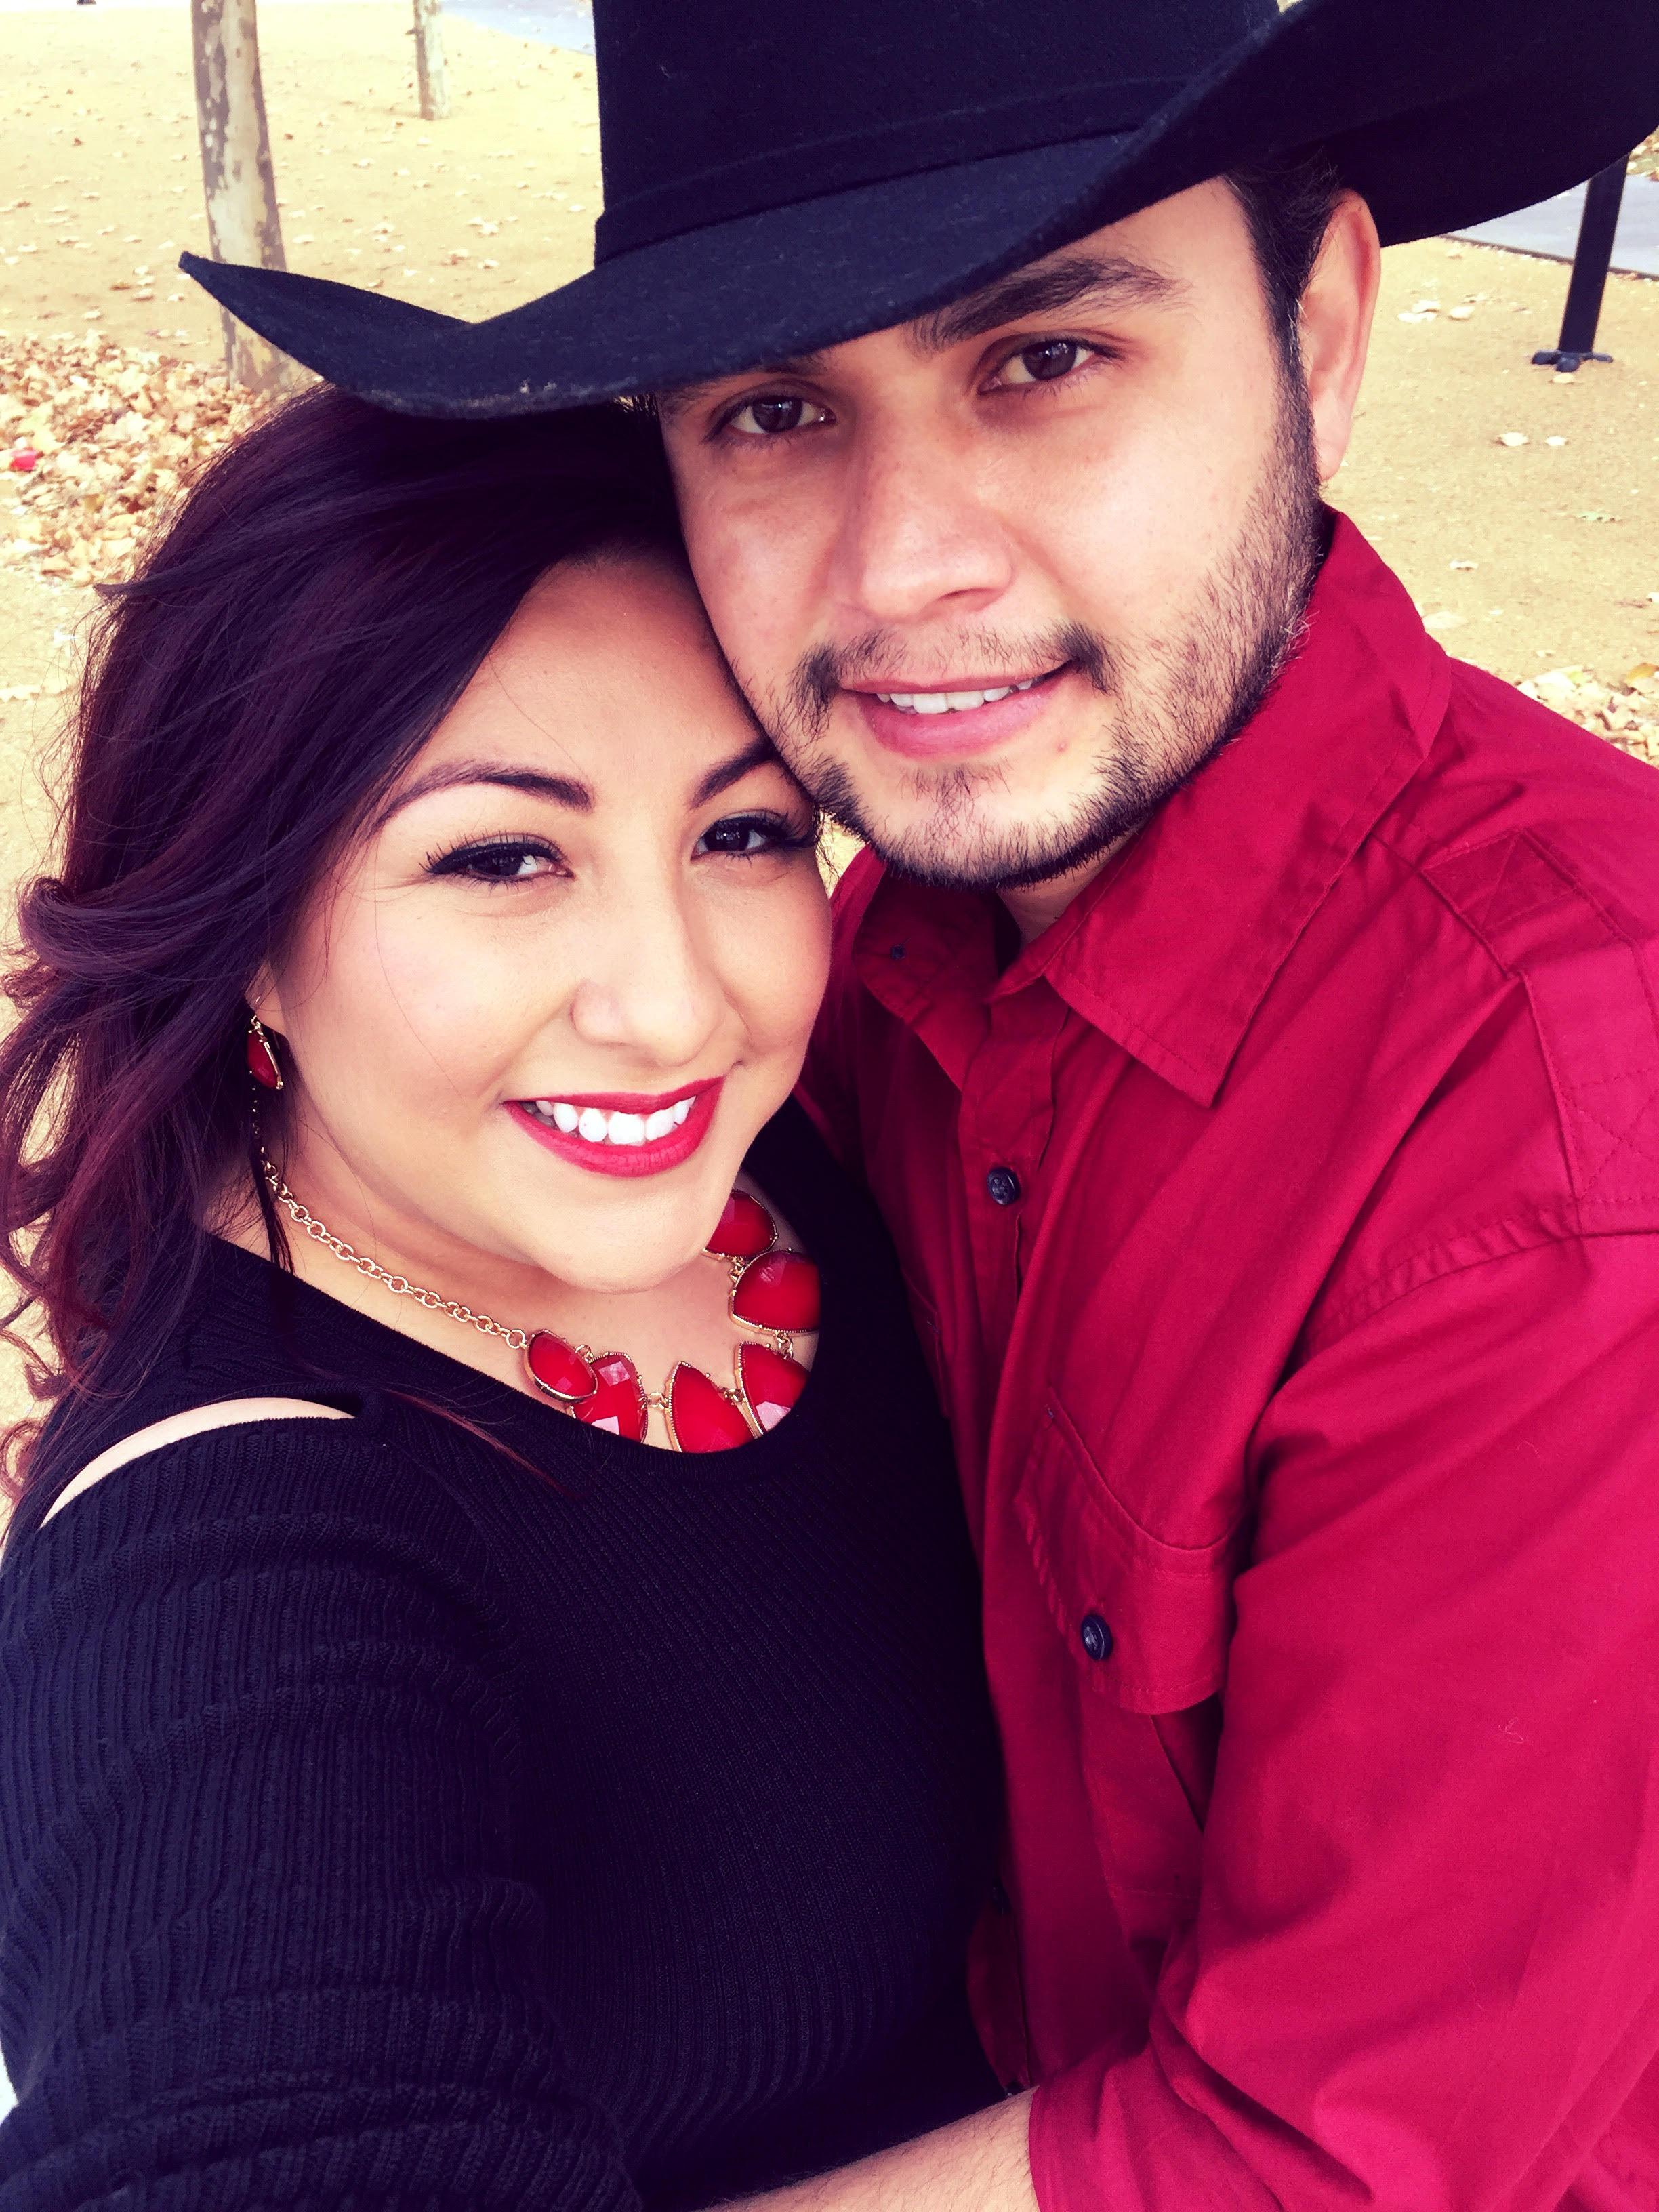 Ricardo Cruz & Dalia Charqueno